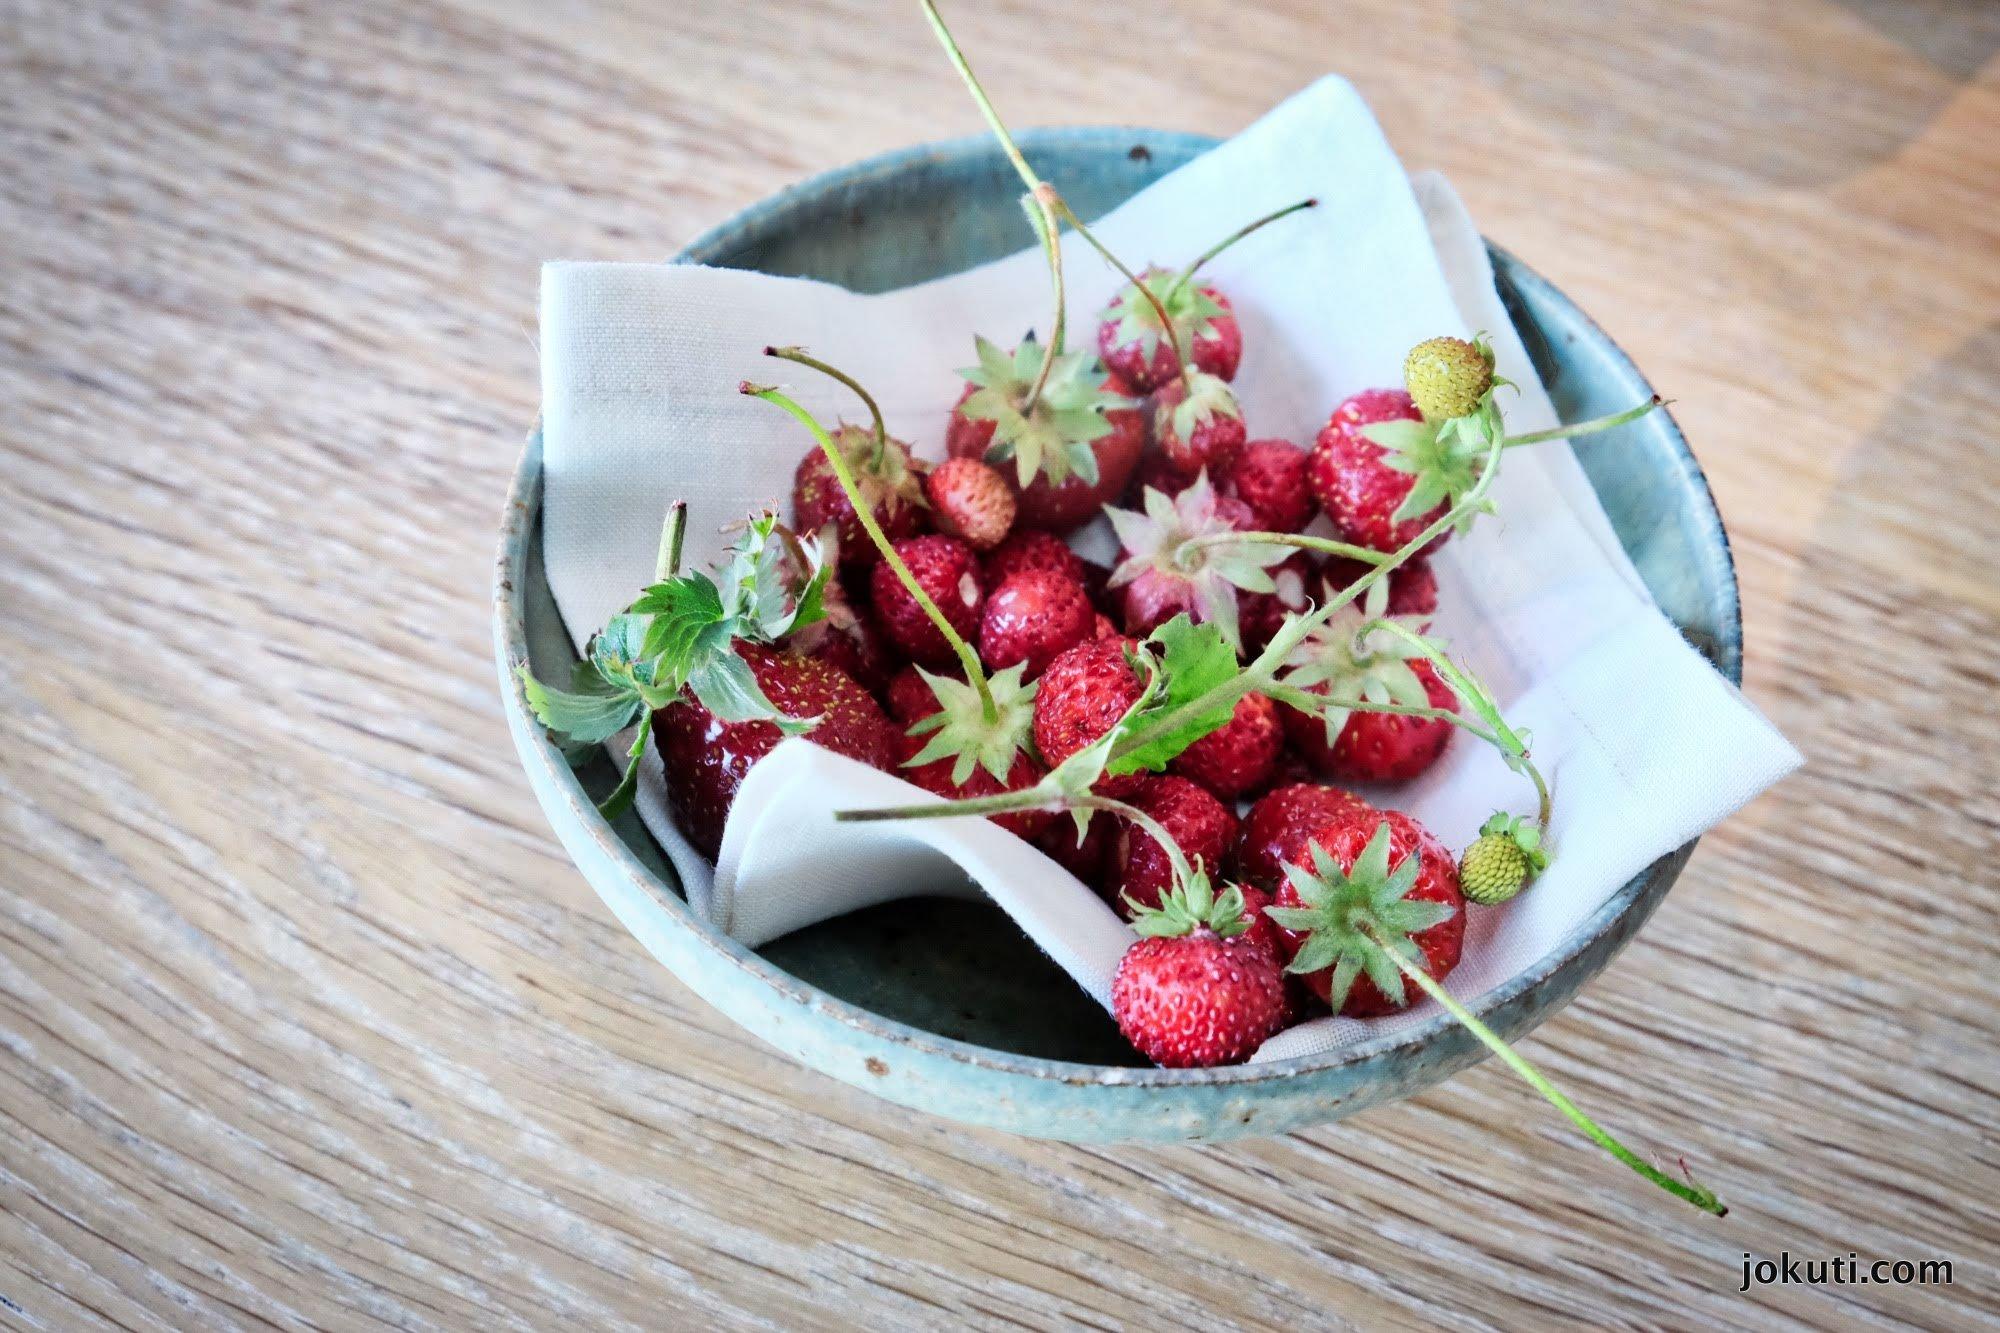 dscf6649_noma_copenhagen_vegeterian_plant_restaurant_redzepi_jokuti_vilagevo_l.jpg